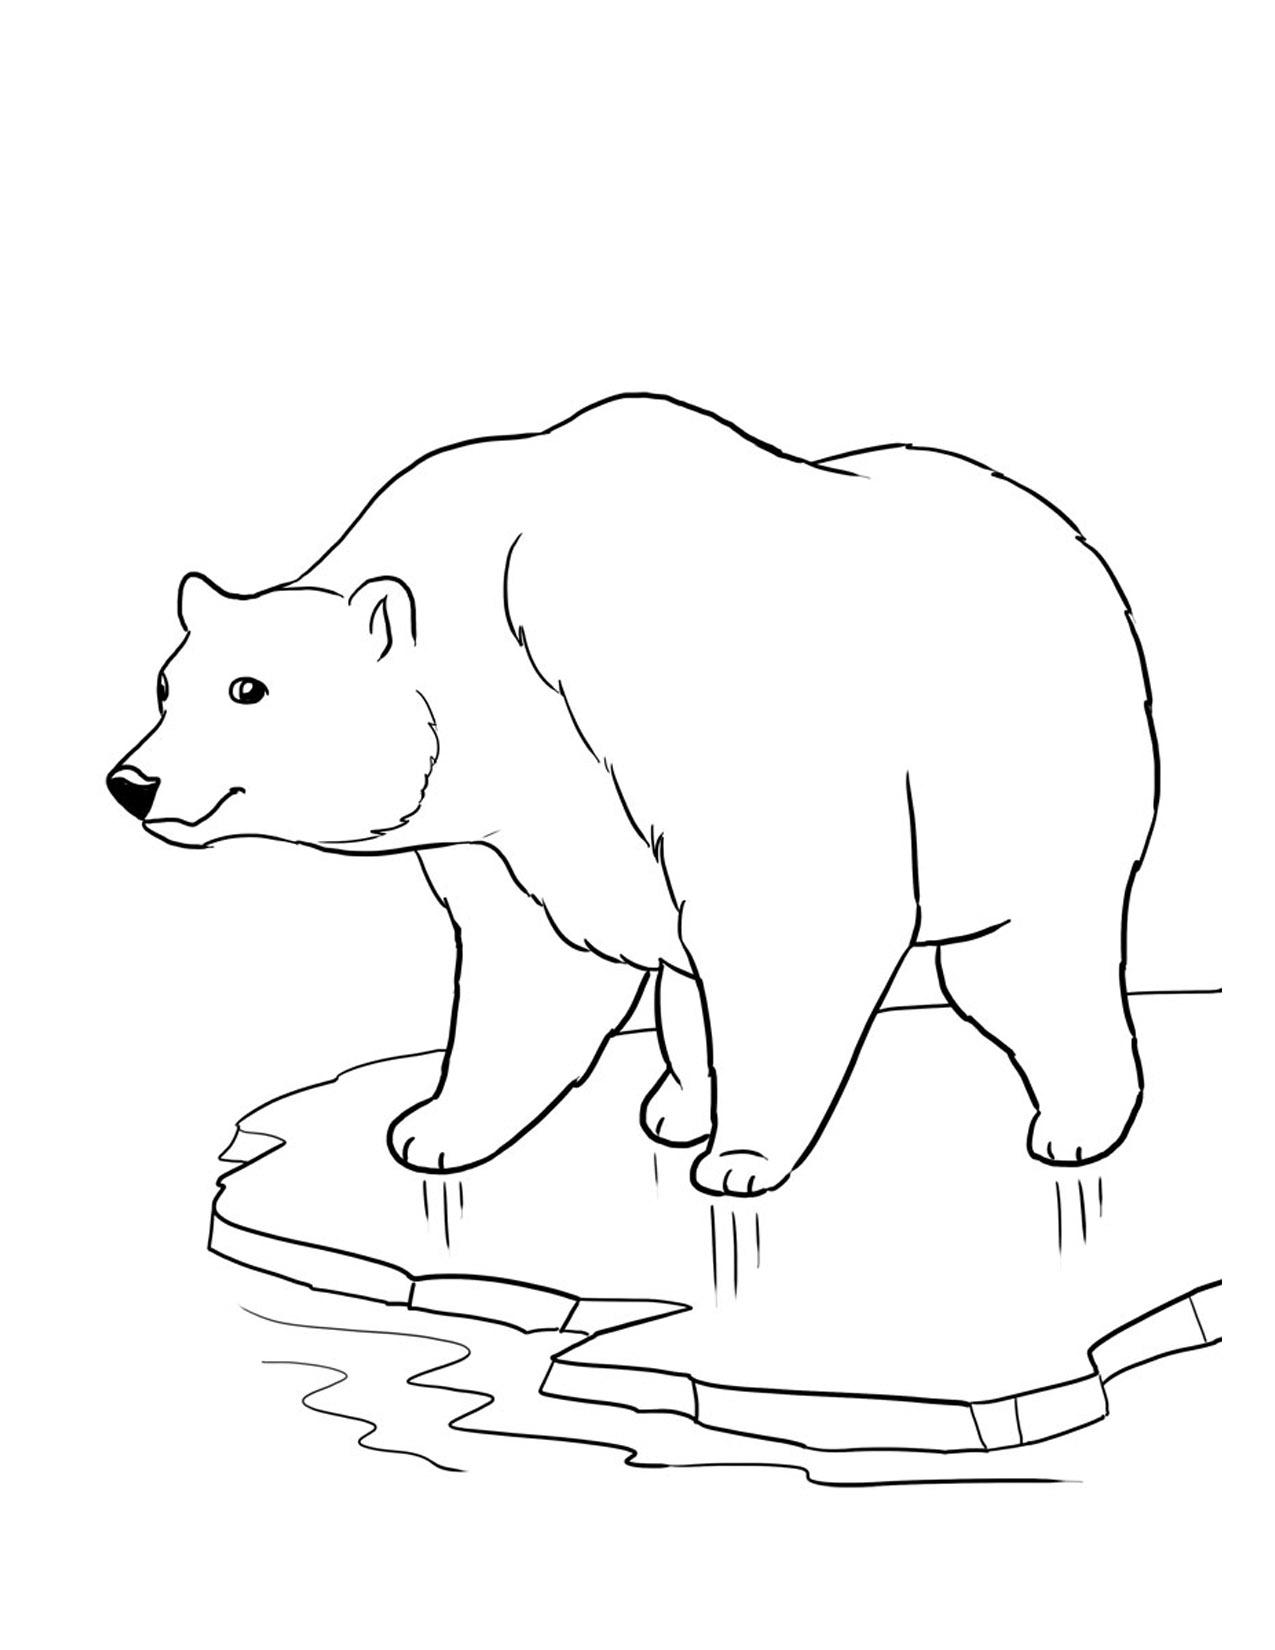 1275x1650 Outline Drawing Of A Polar Bear Color Sheets Of Polar Bears